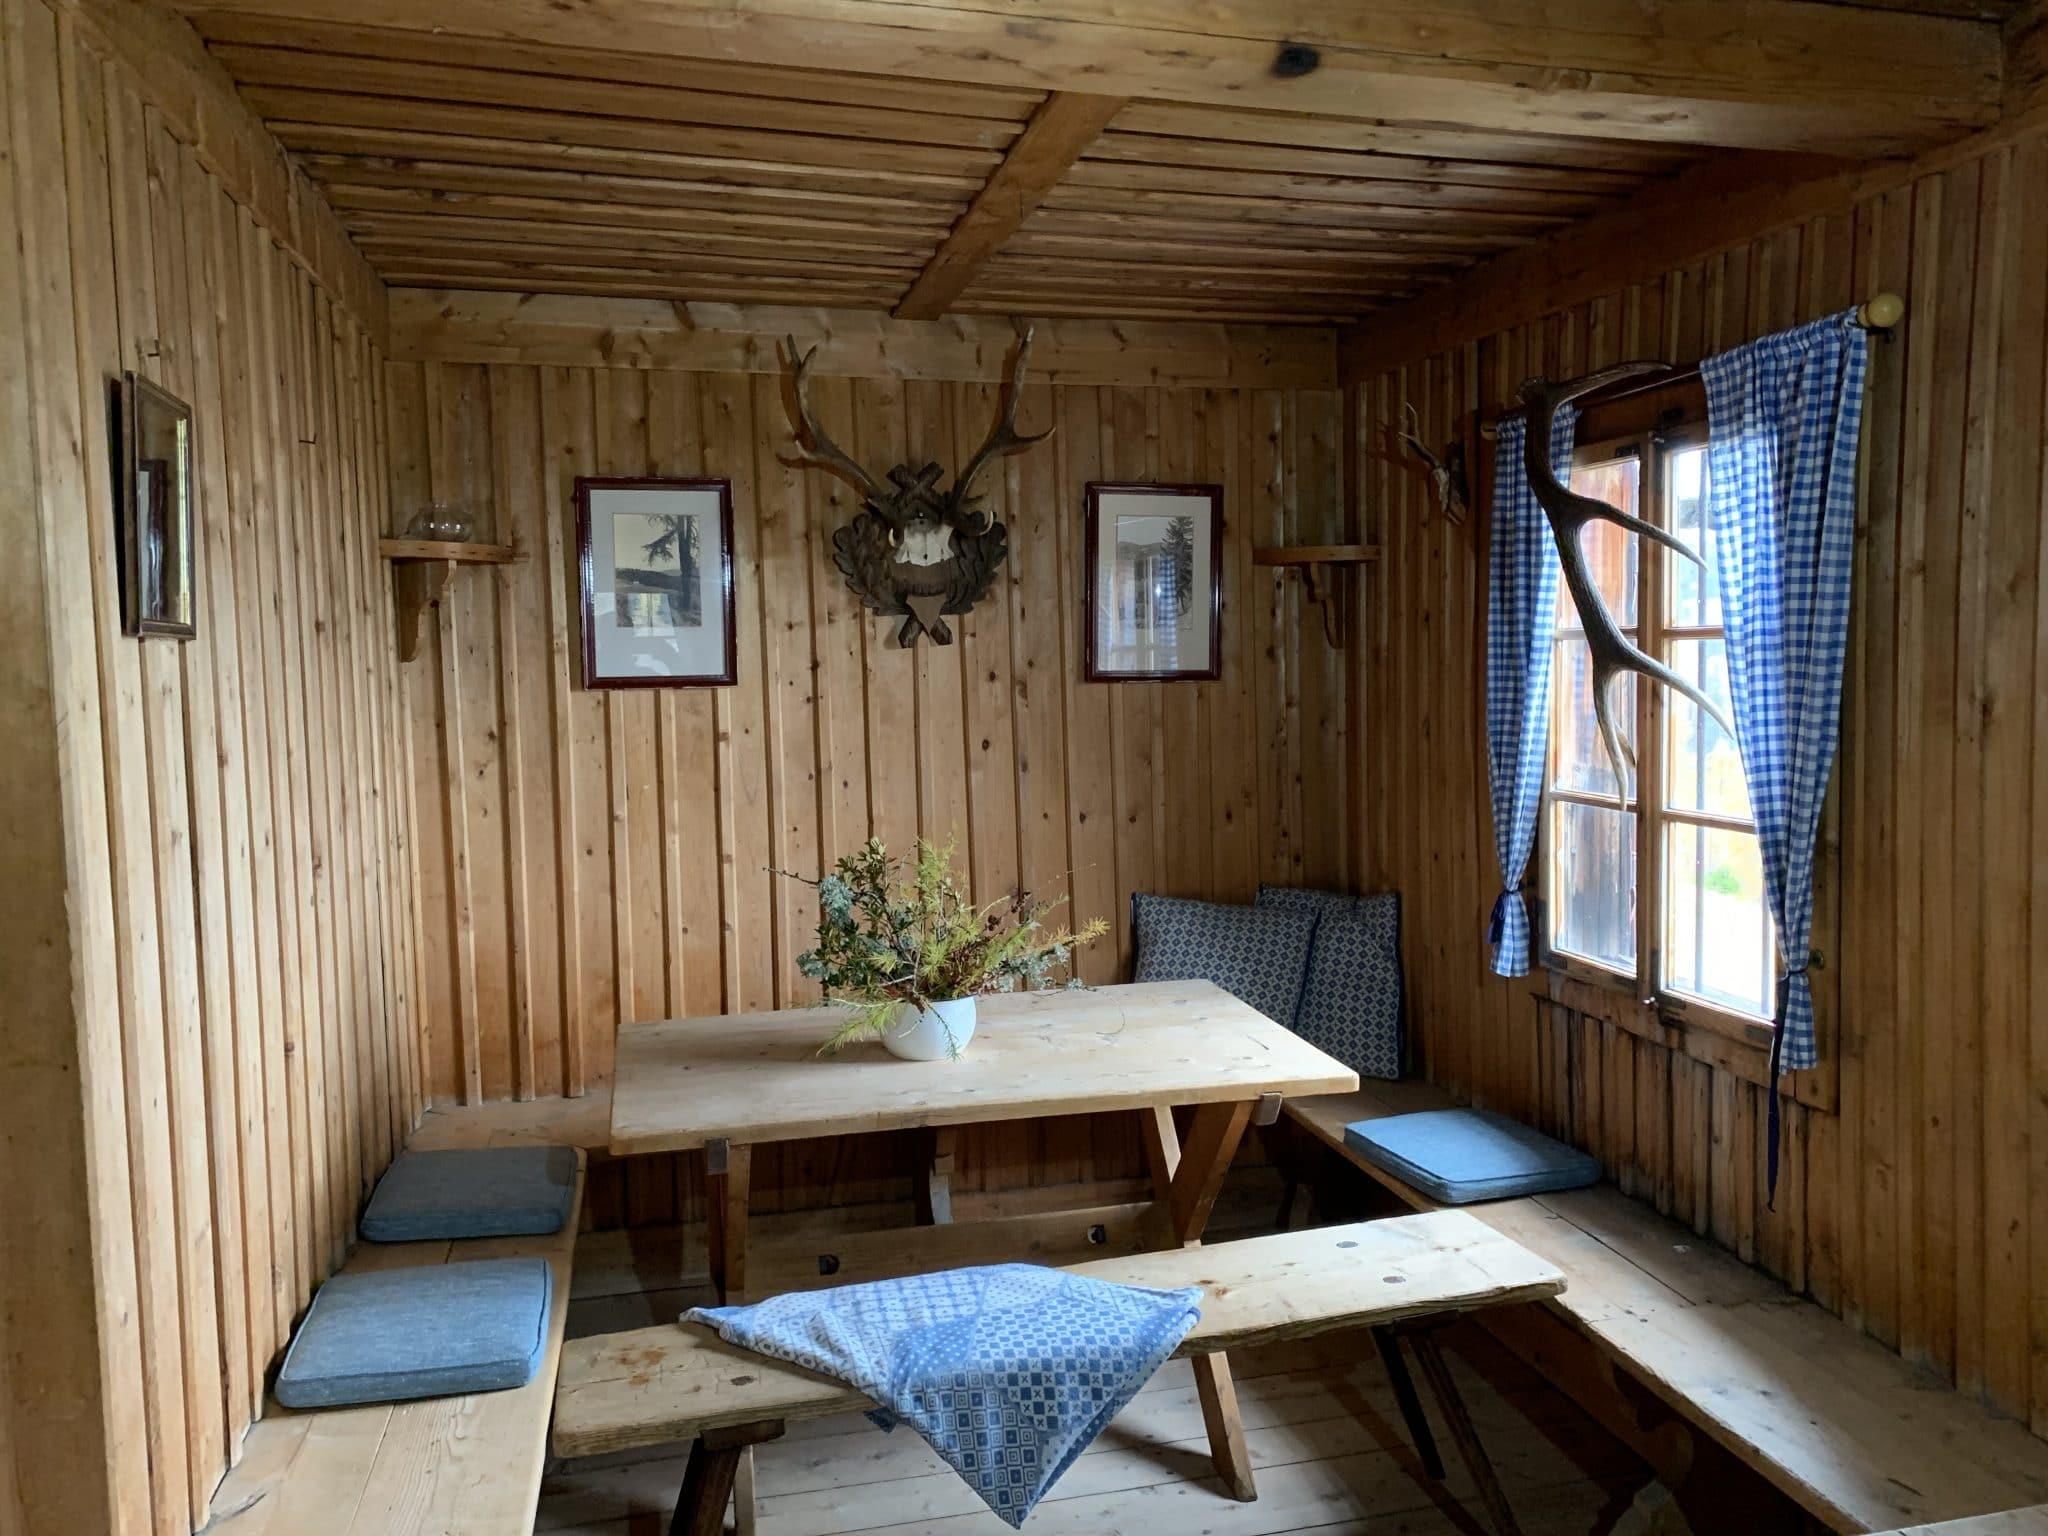 Wandern in Kärnten nahe unserer Selbstversorgerhütte